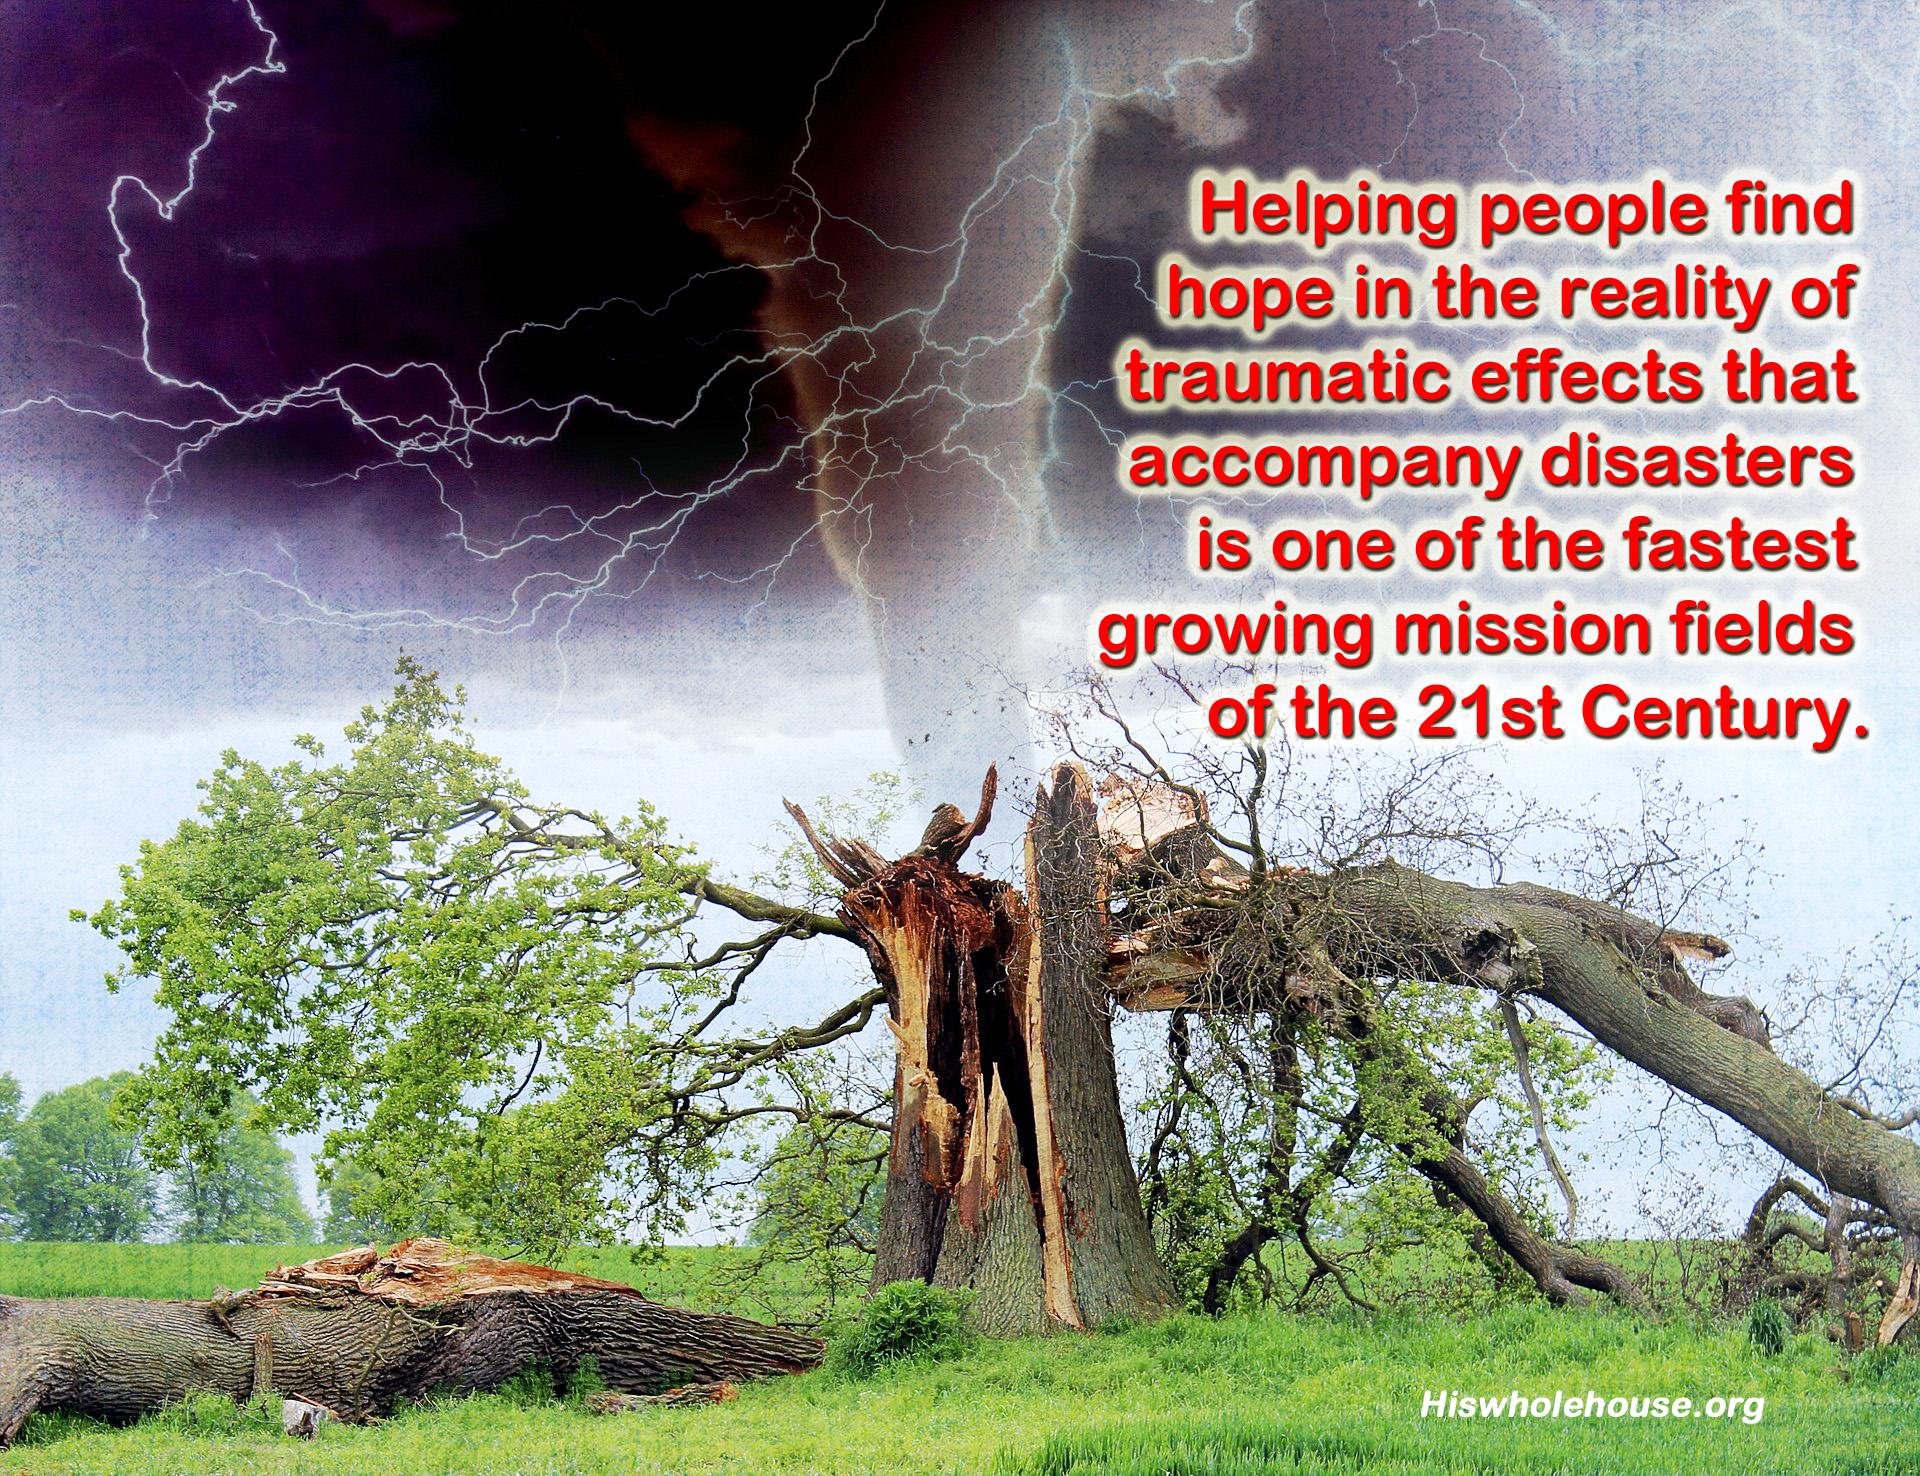 tornado-1193184_1920_edited-1.jpg